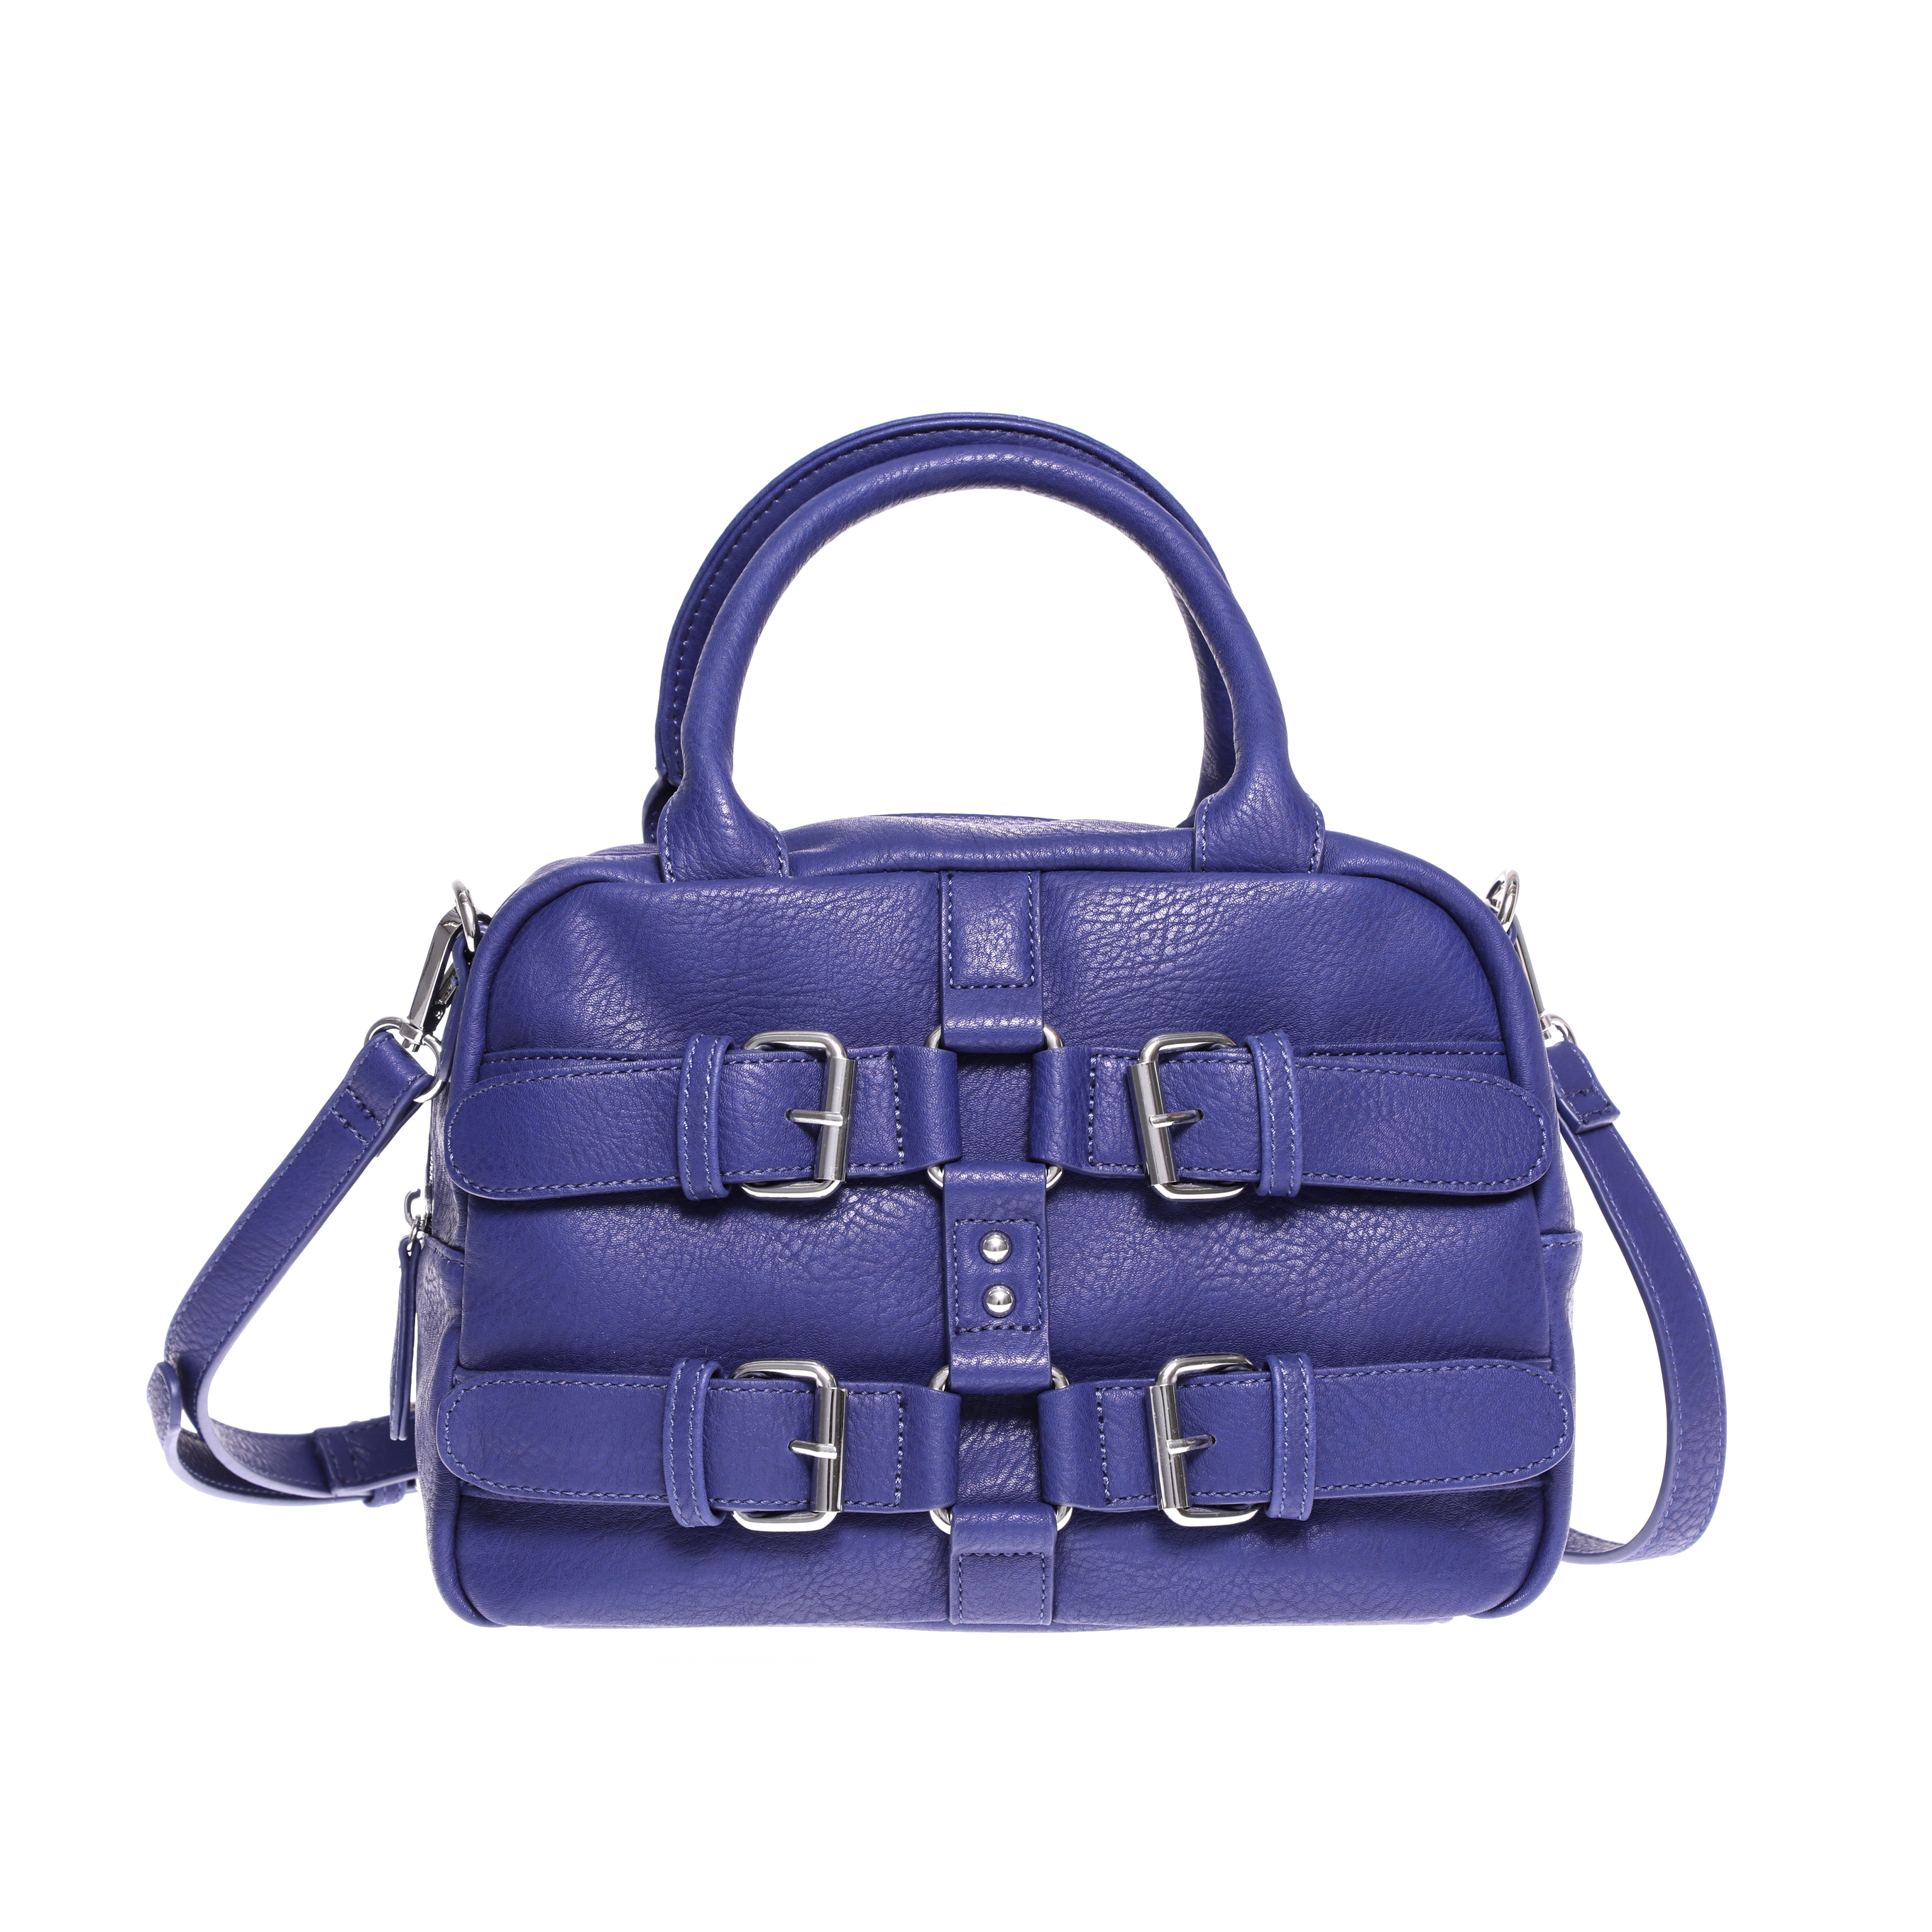 DENNY ROSE – Γυναικεία τσάντα Denny Rose μπλε-μωβ 1596977.0-D100